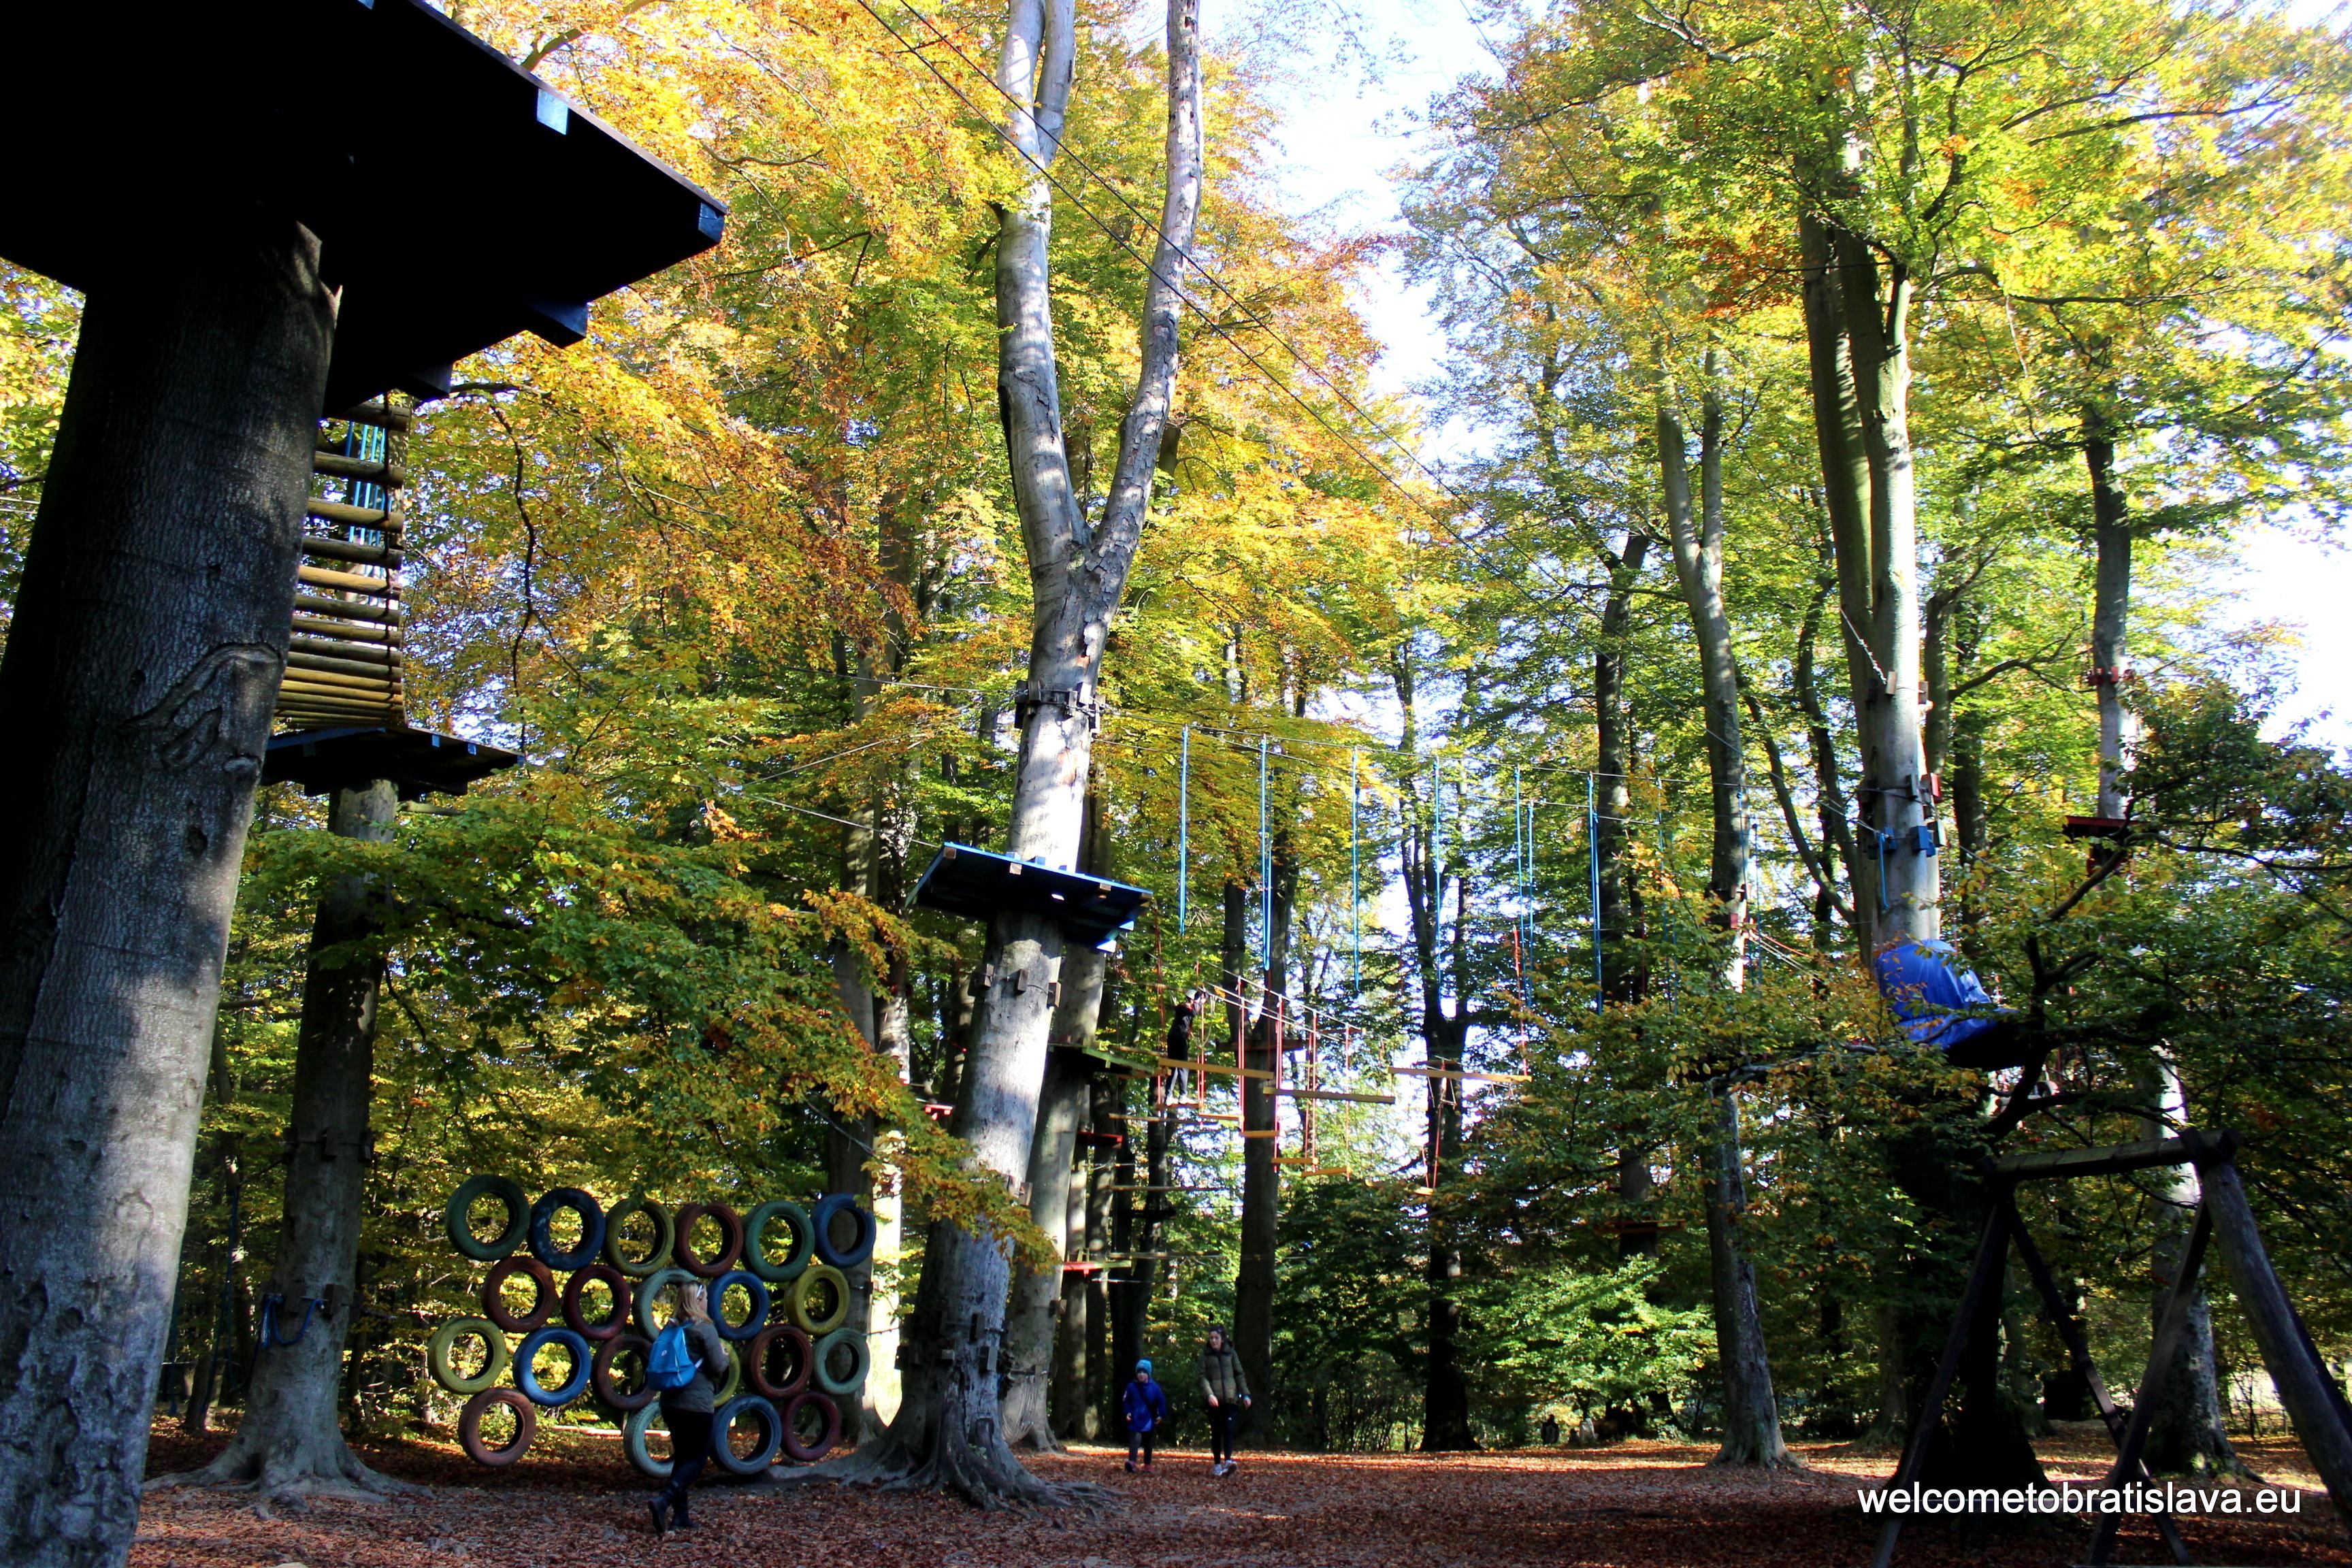 Outdoor places for kids in Bratislava - Lanoland Koliba